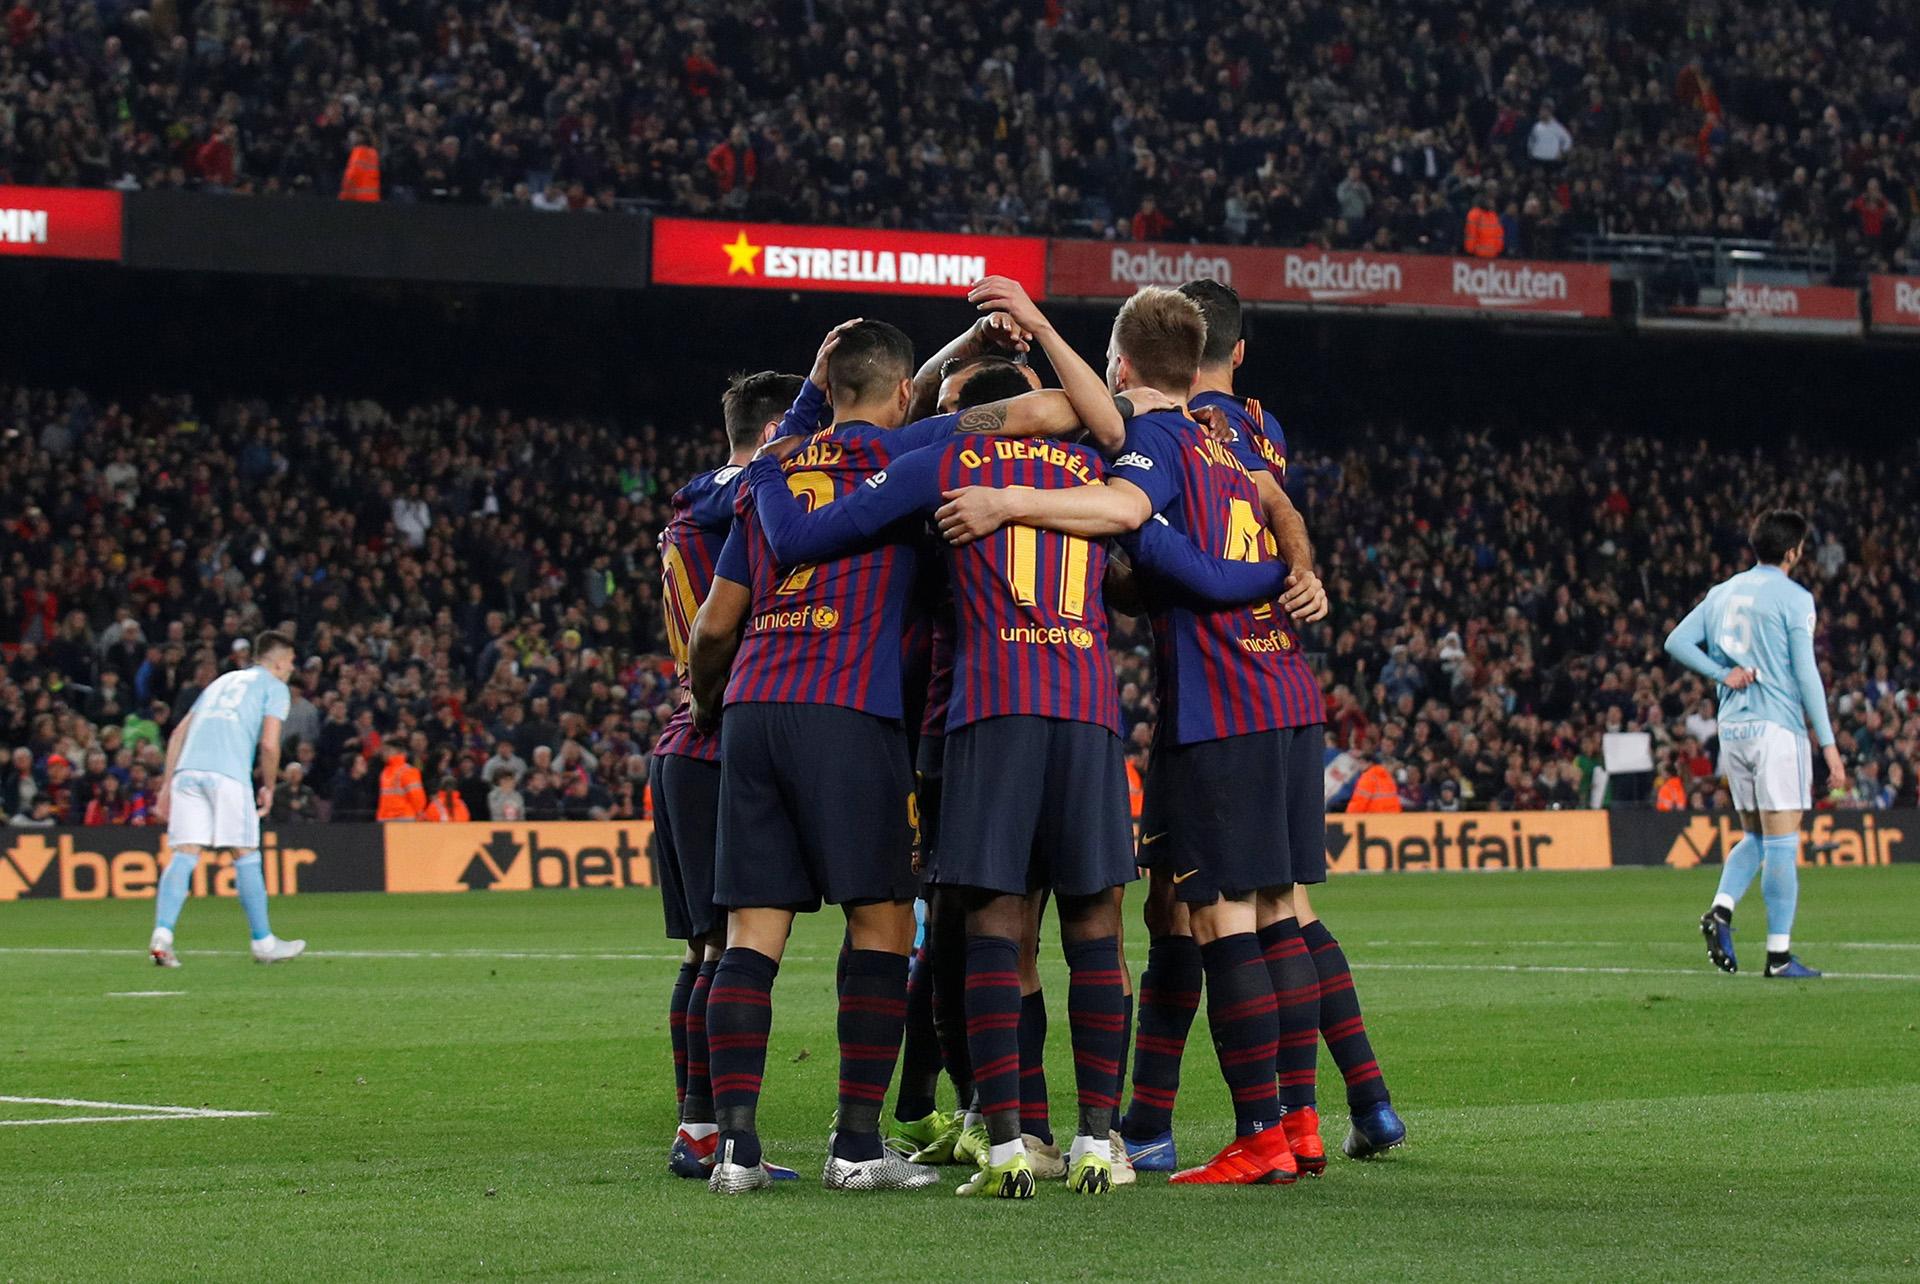 Barcelonaacumula cuatro triunfos al hilo